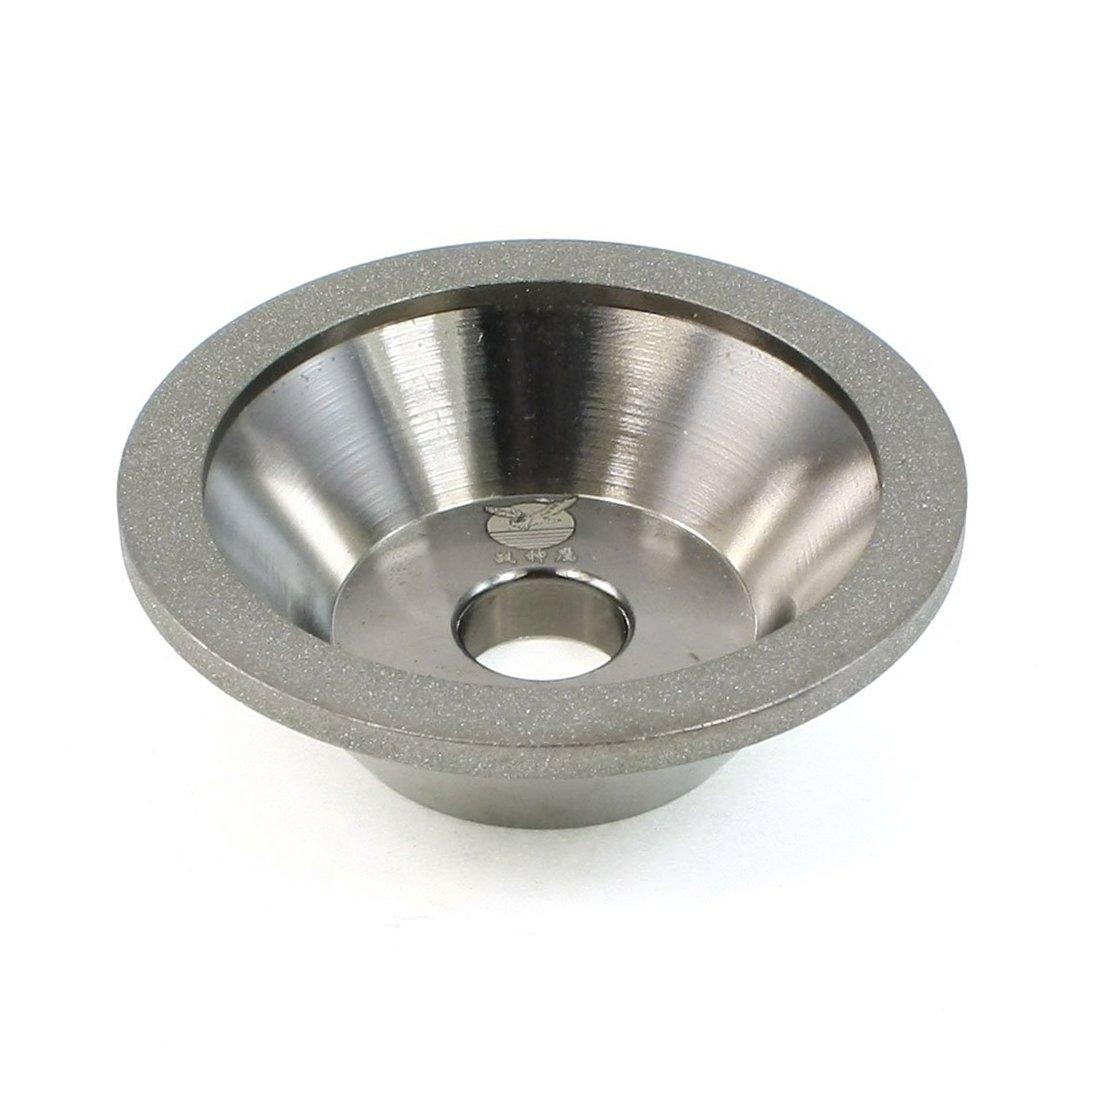 Preamer 100*32*20*10*5 Cup Diamond Grinding Wheel for Alloy Blade Tungsten